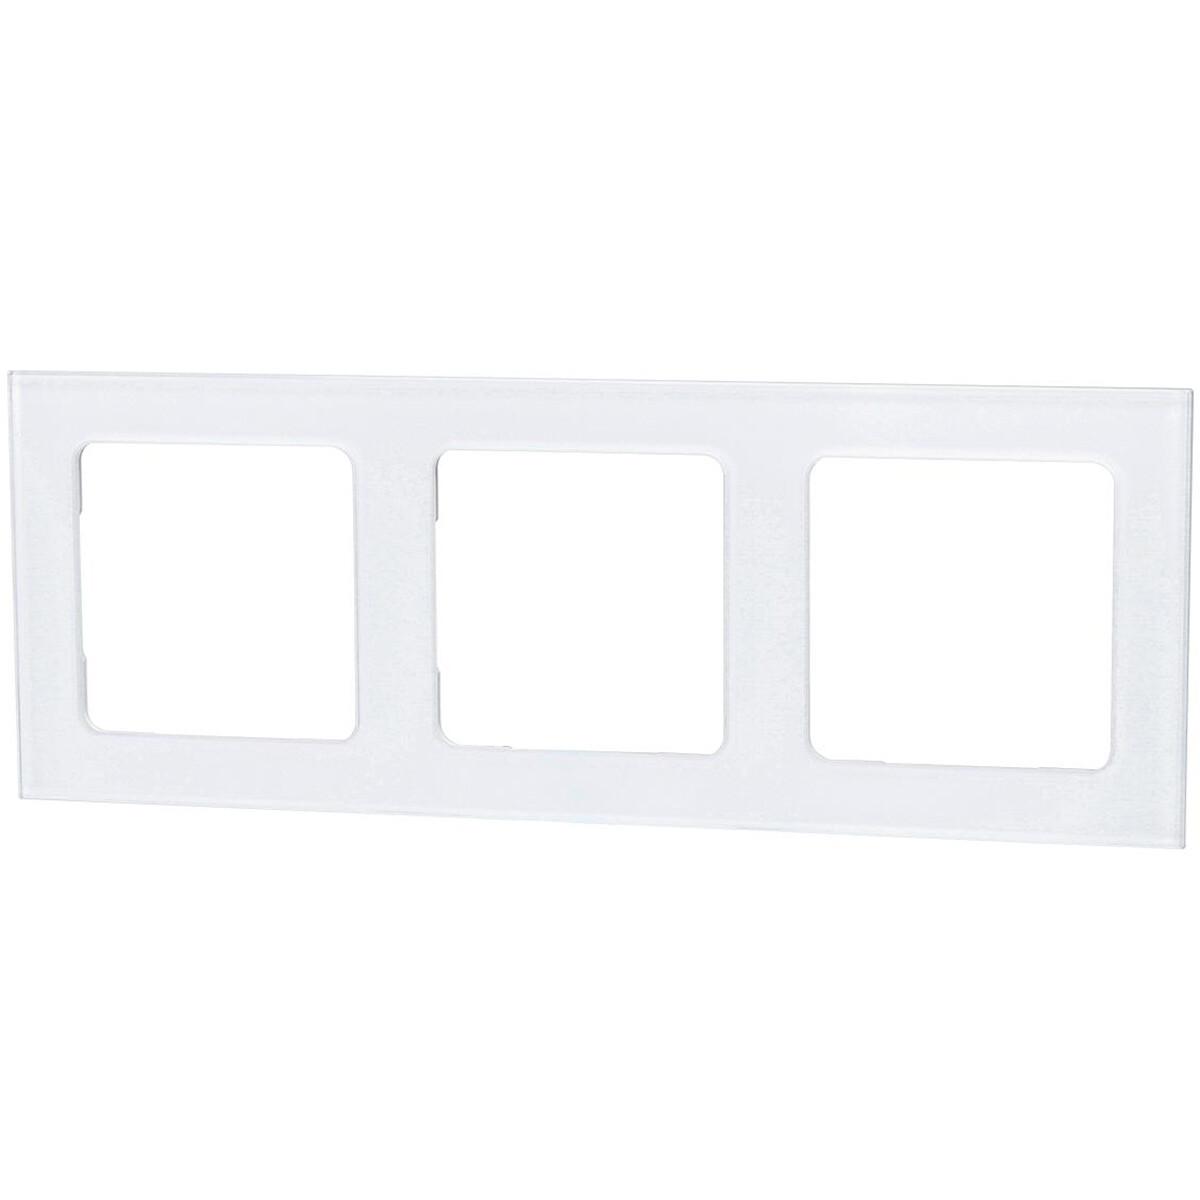 Afdekraam - Aigi Jura - 3-voudig - Vierkant - Glas - Wit